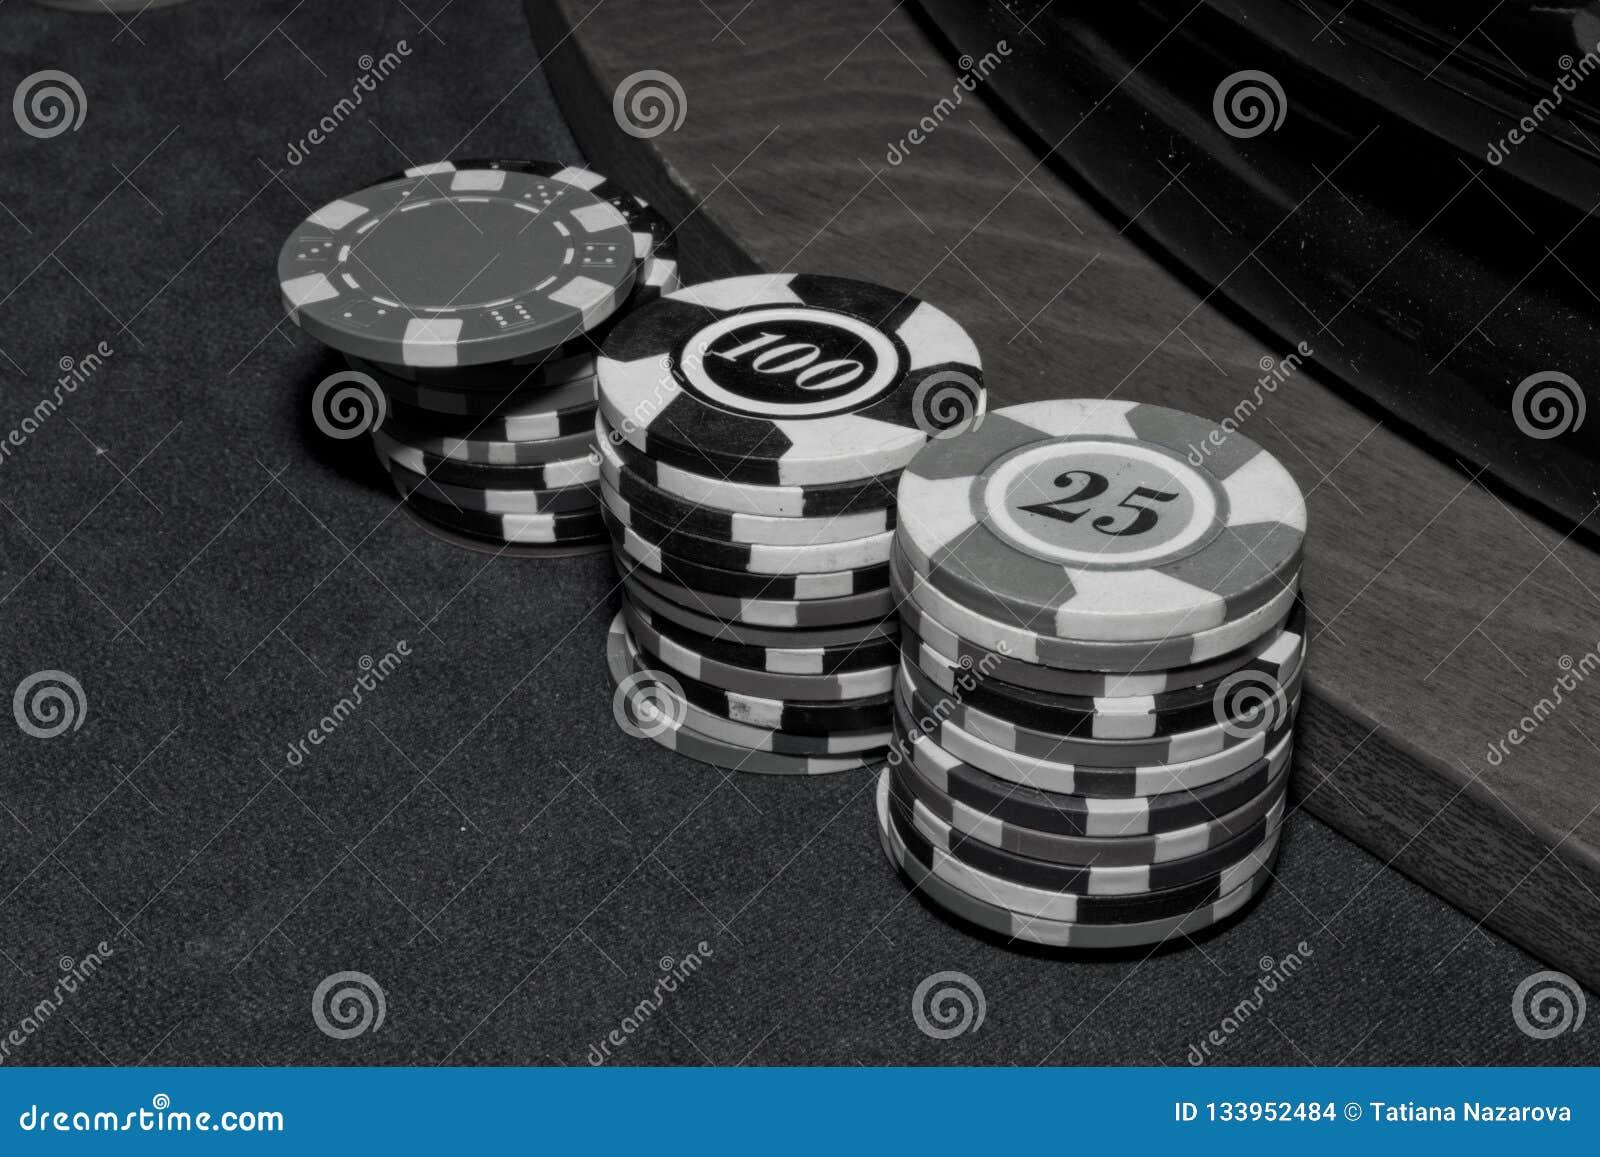 Desconta no casino, preto e branco